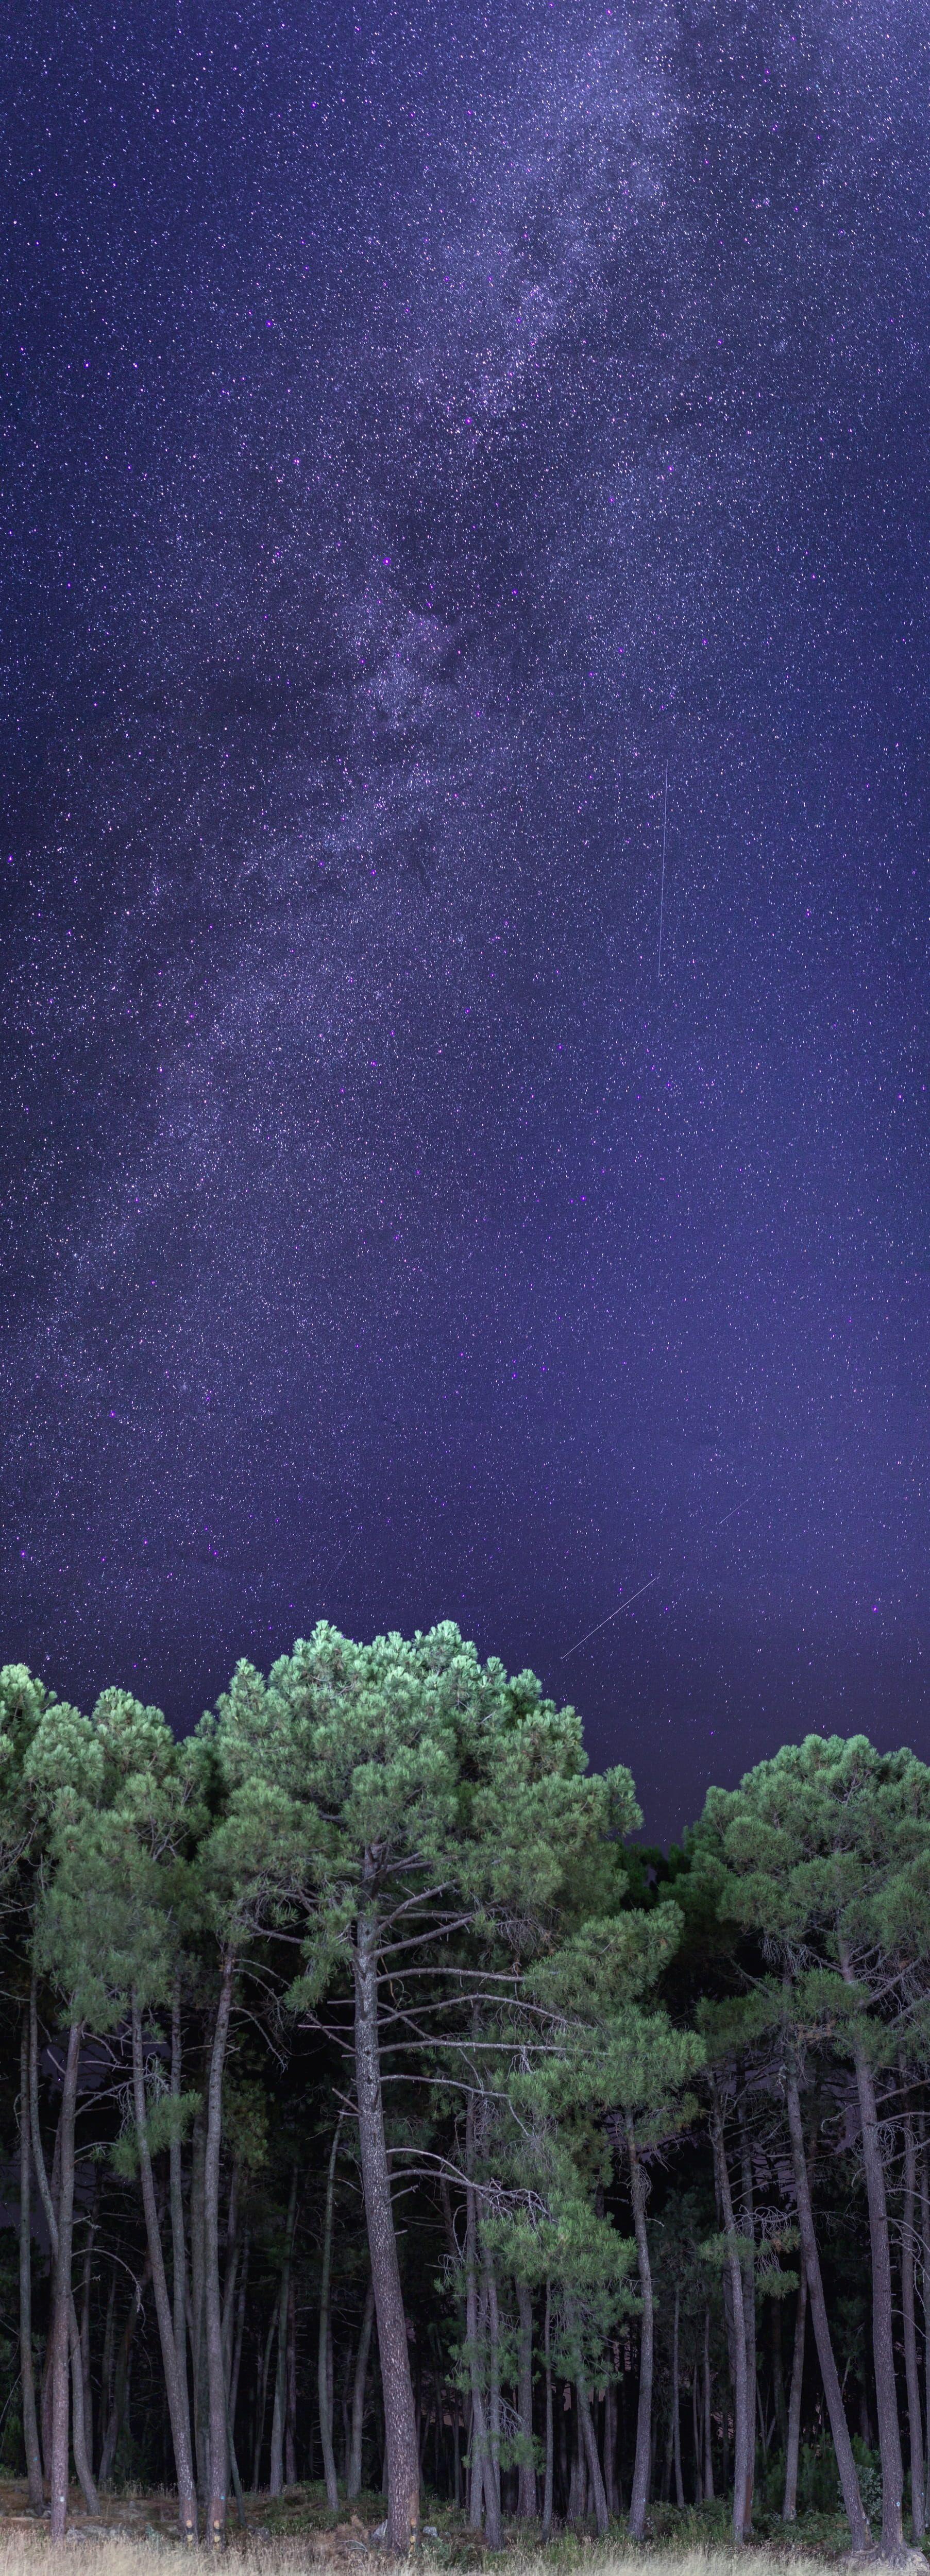 Night Star Via Lactea Universe Forest Nature Sky Panoramic Vertical 4k Wallpaper Hdwallpaper Desktop Imac Desktop Imac Cactus Backgrounds